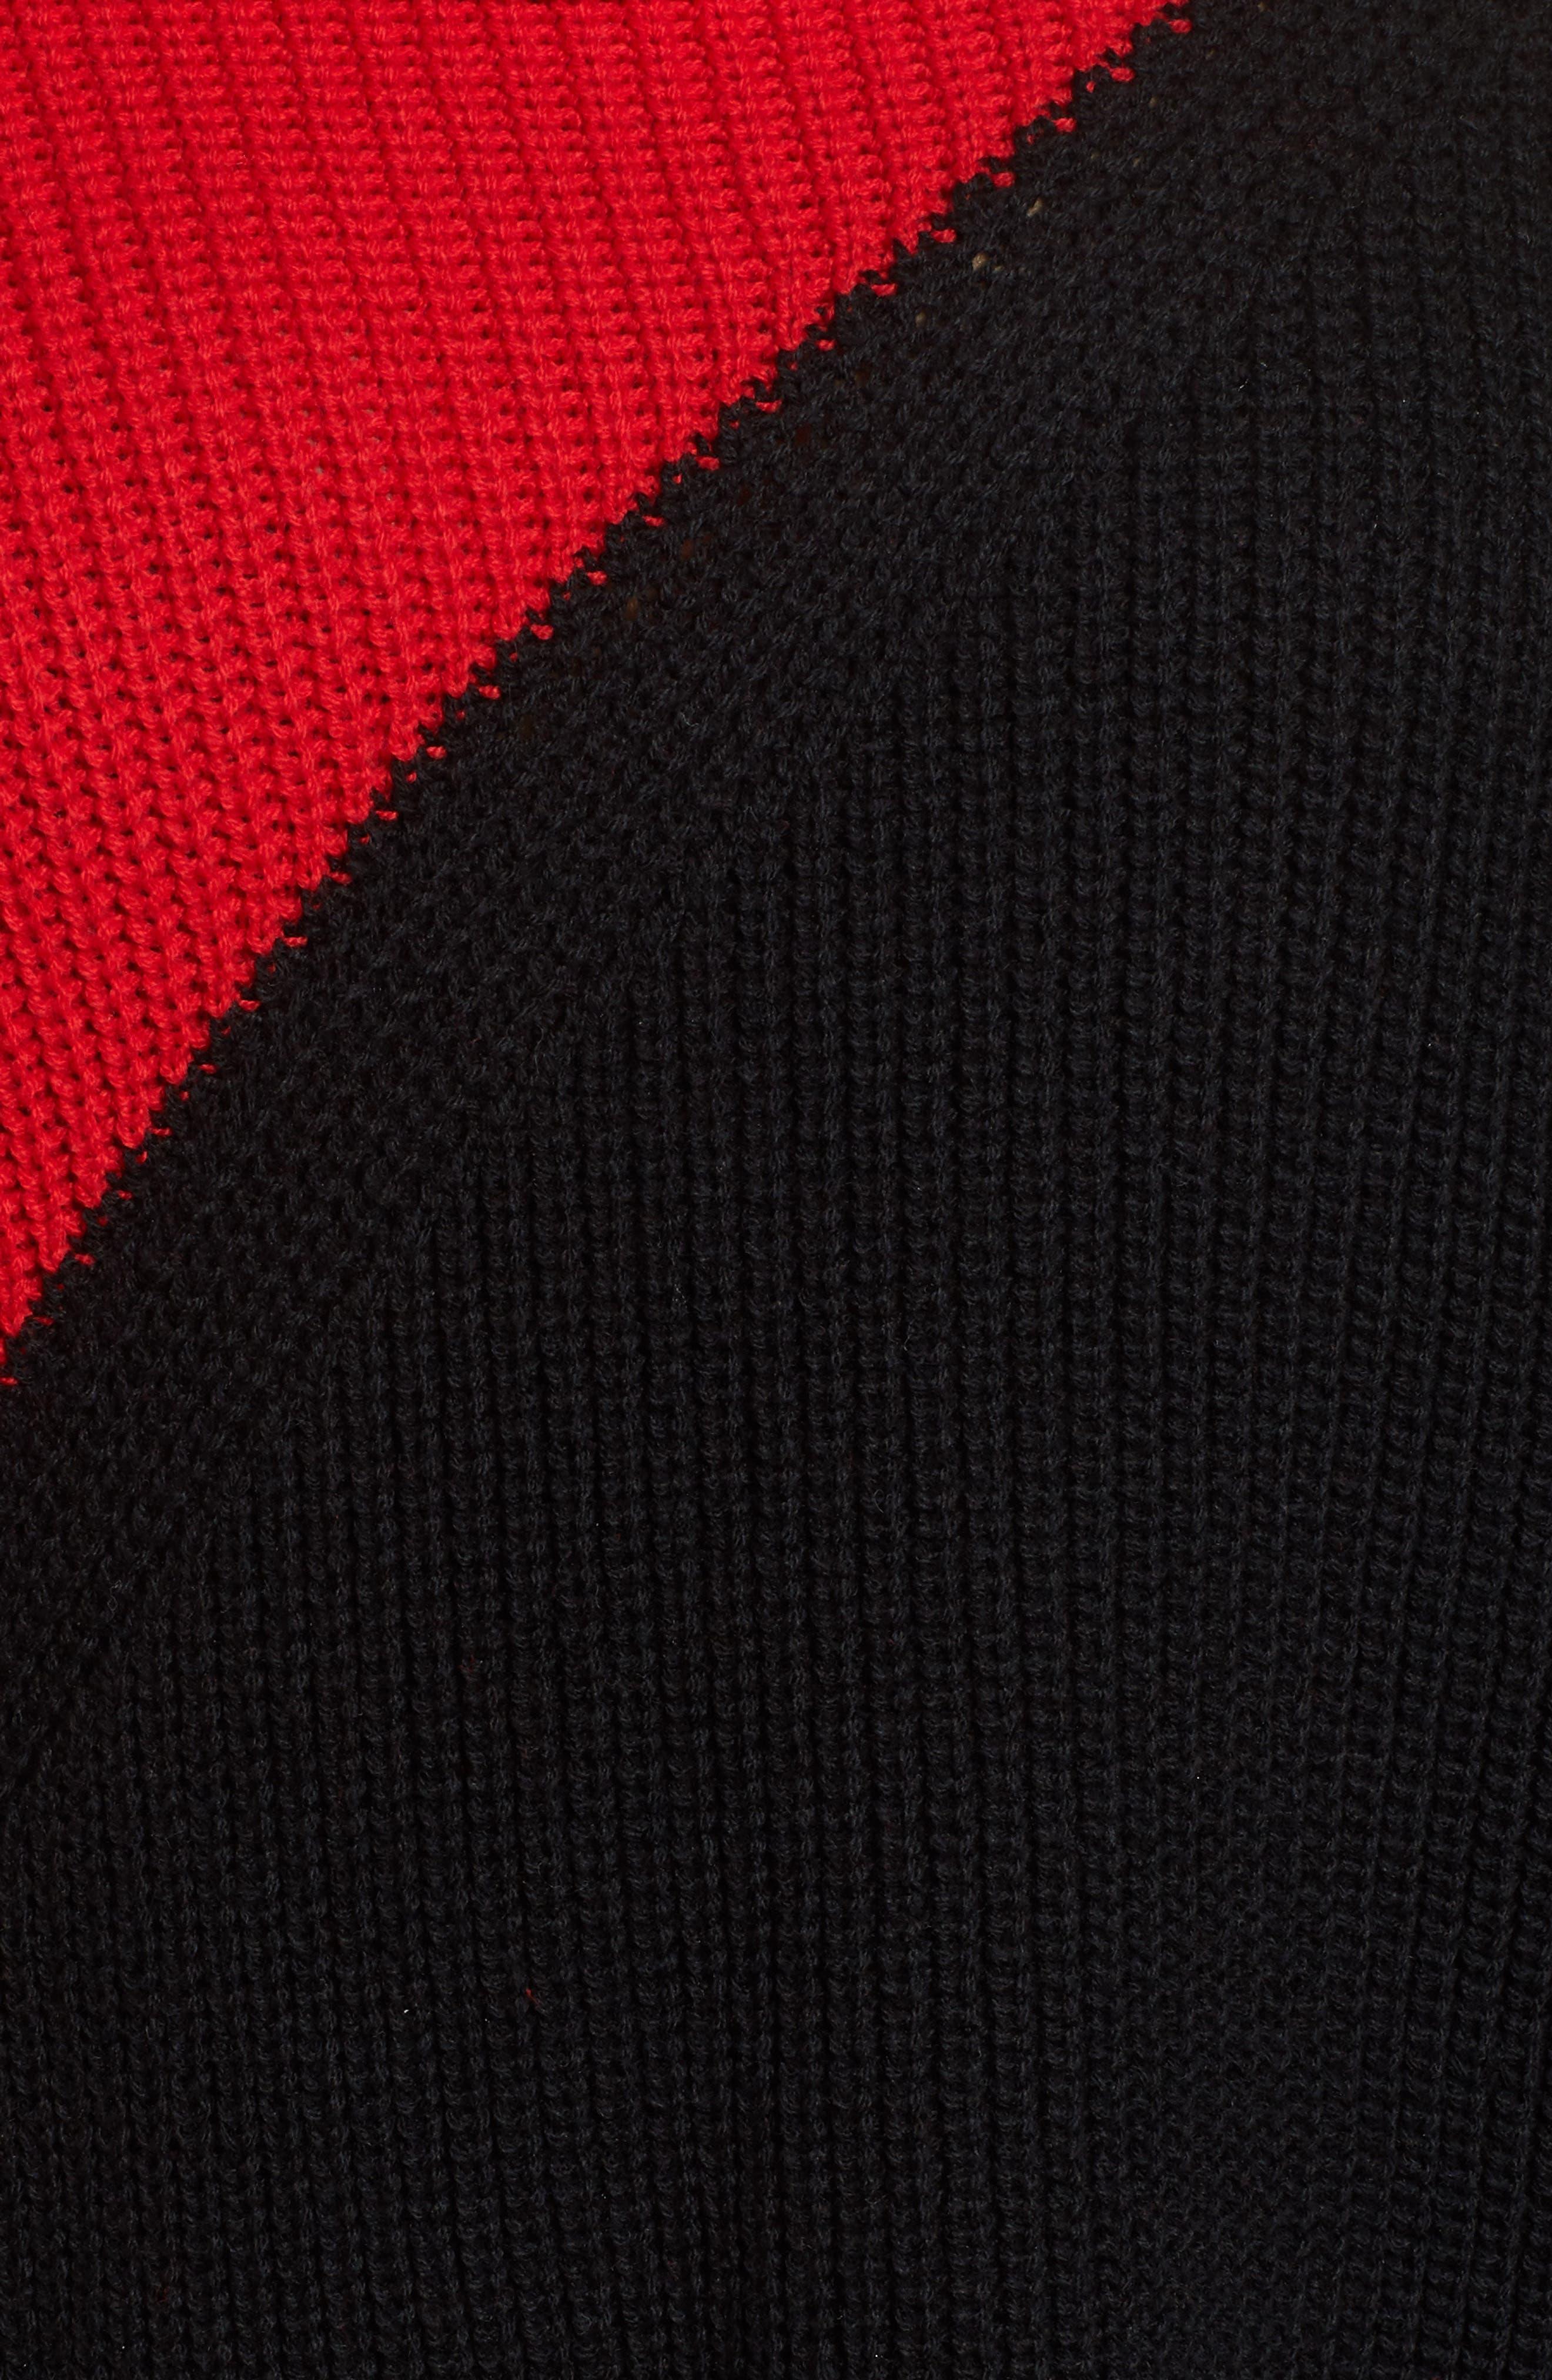 Colorblock Cowl Neck Sweater,                             Alternate thumbnail 5, color,                             Rouge